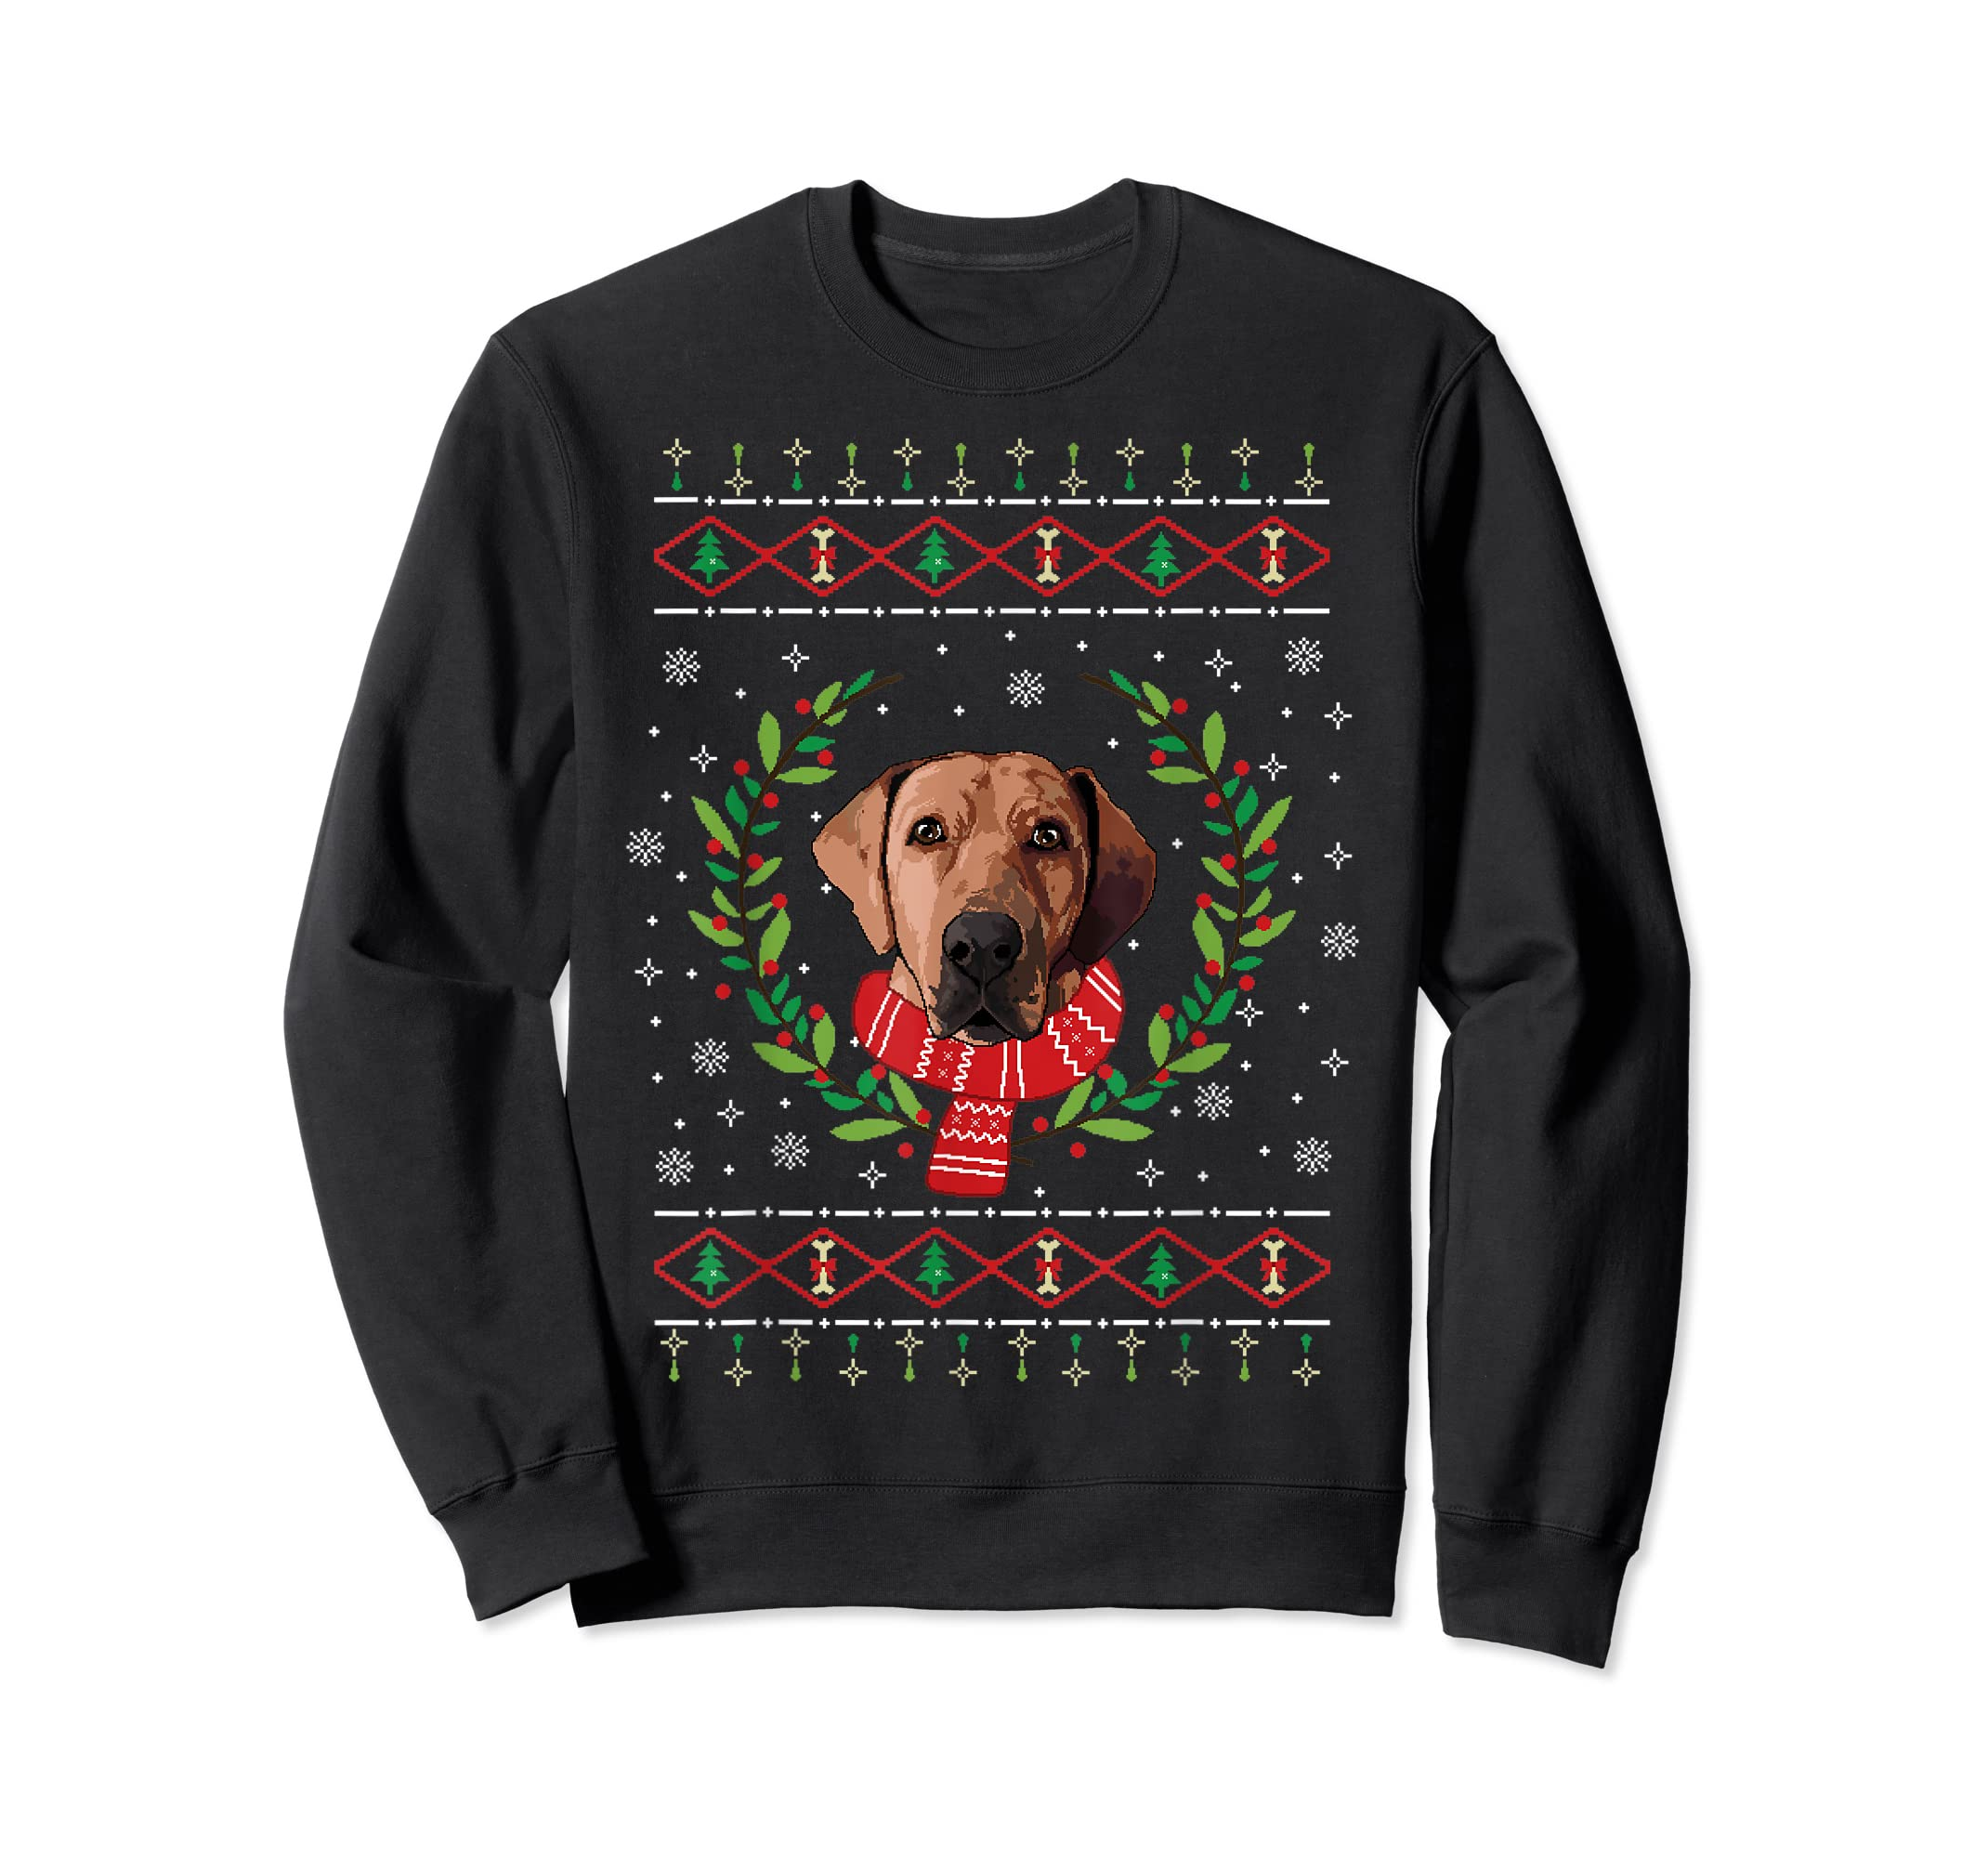 Broholmer Ugly Christmas Jumper T-Shirt Gift T-Shirt-Sweatshirt-Black